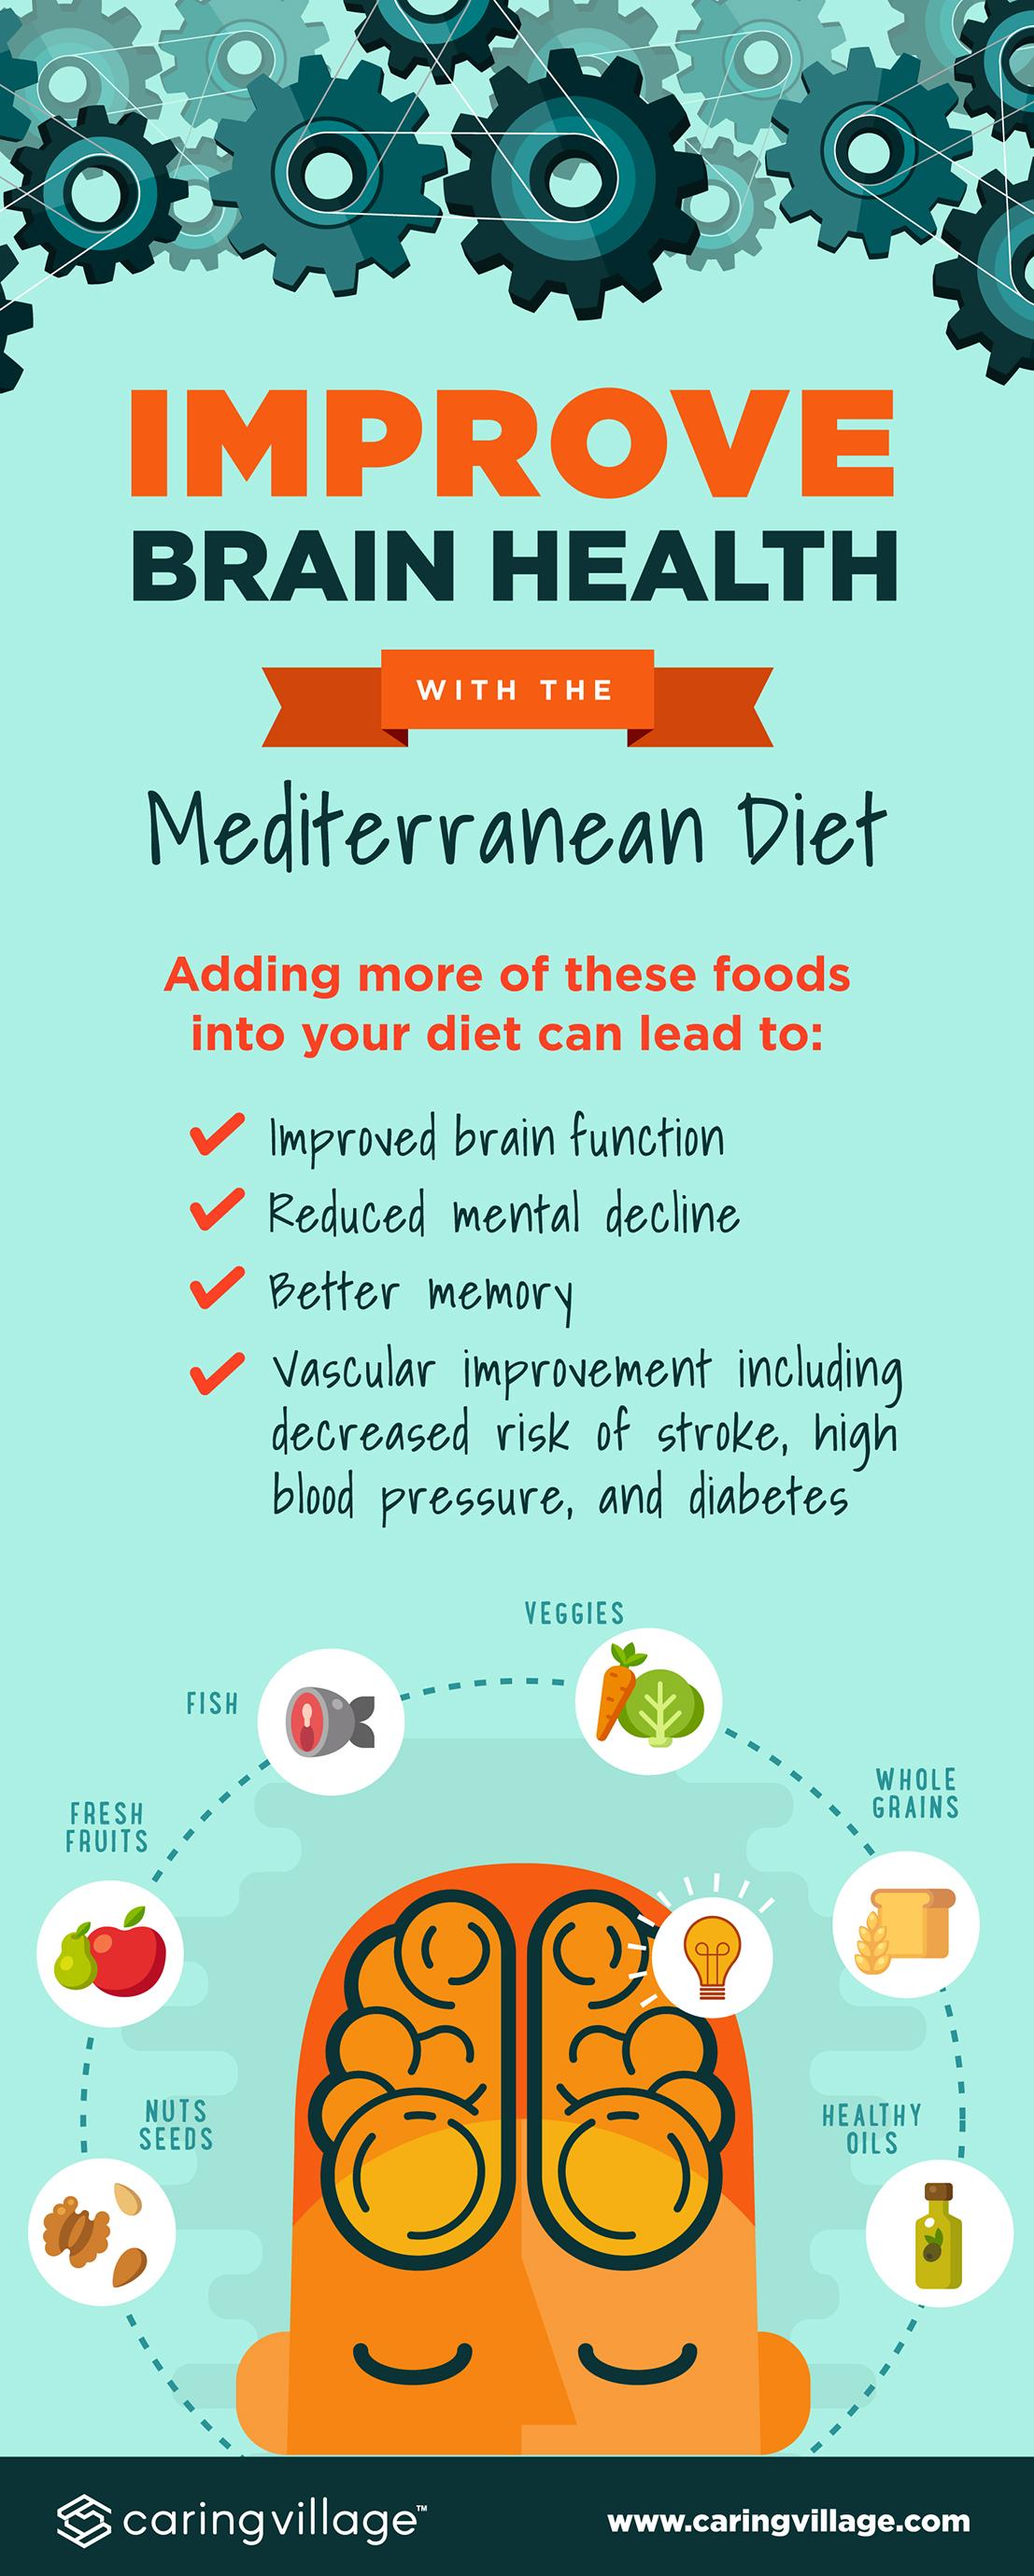 Improve your brain health with the Mediterranean diet